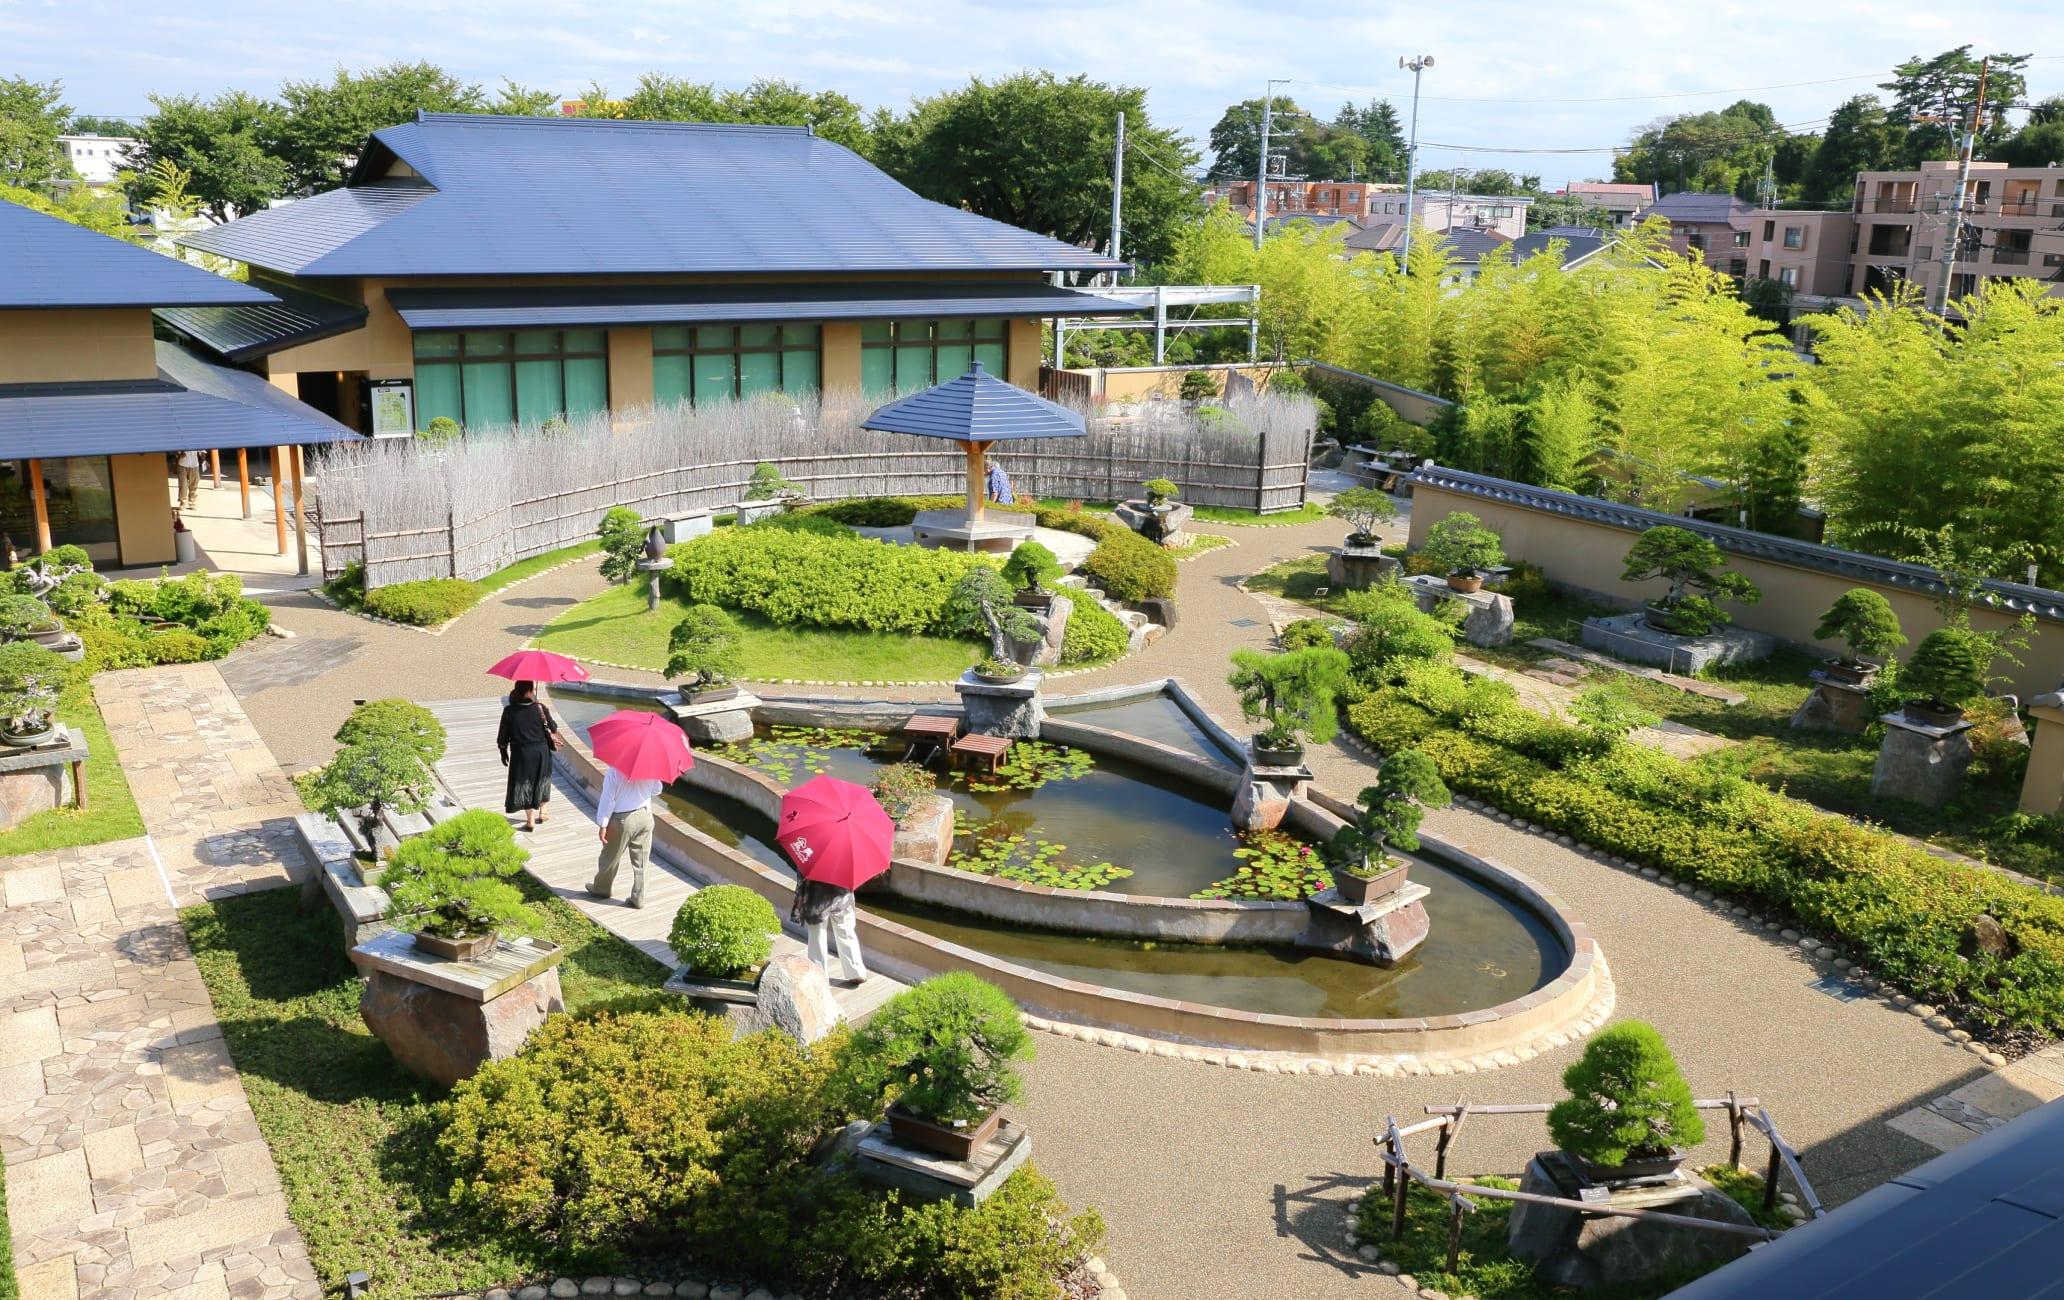 The Omiya Bonsai Art Museum